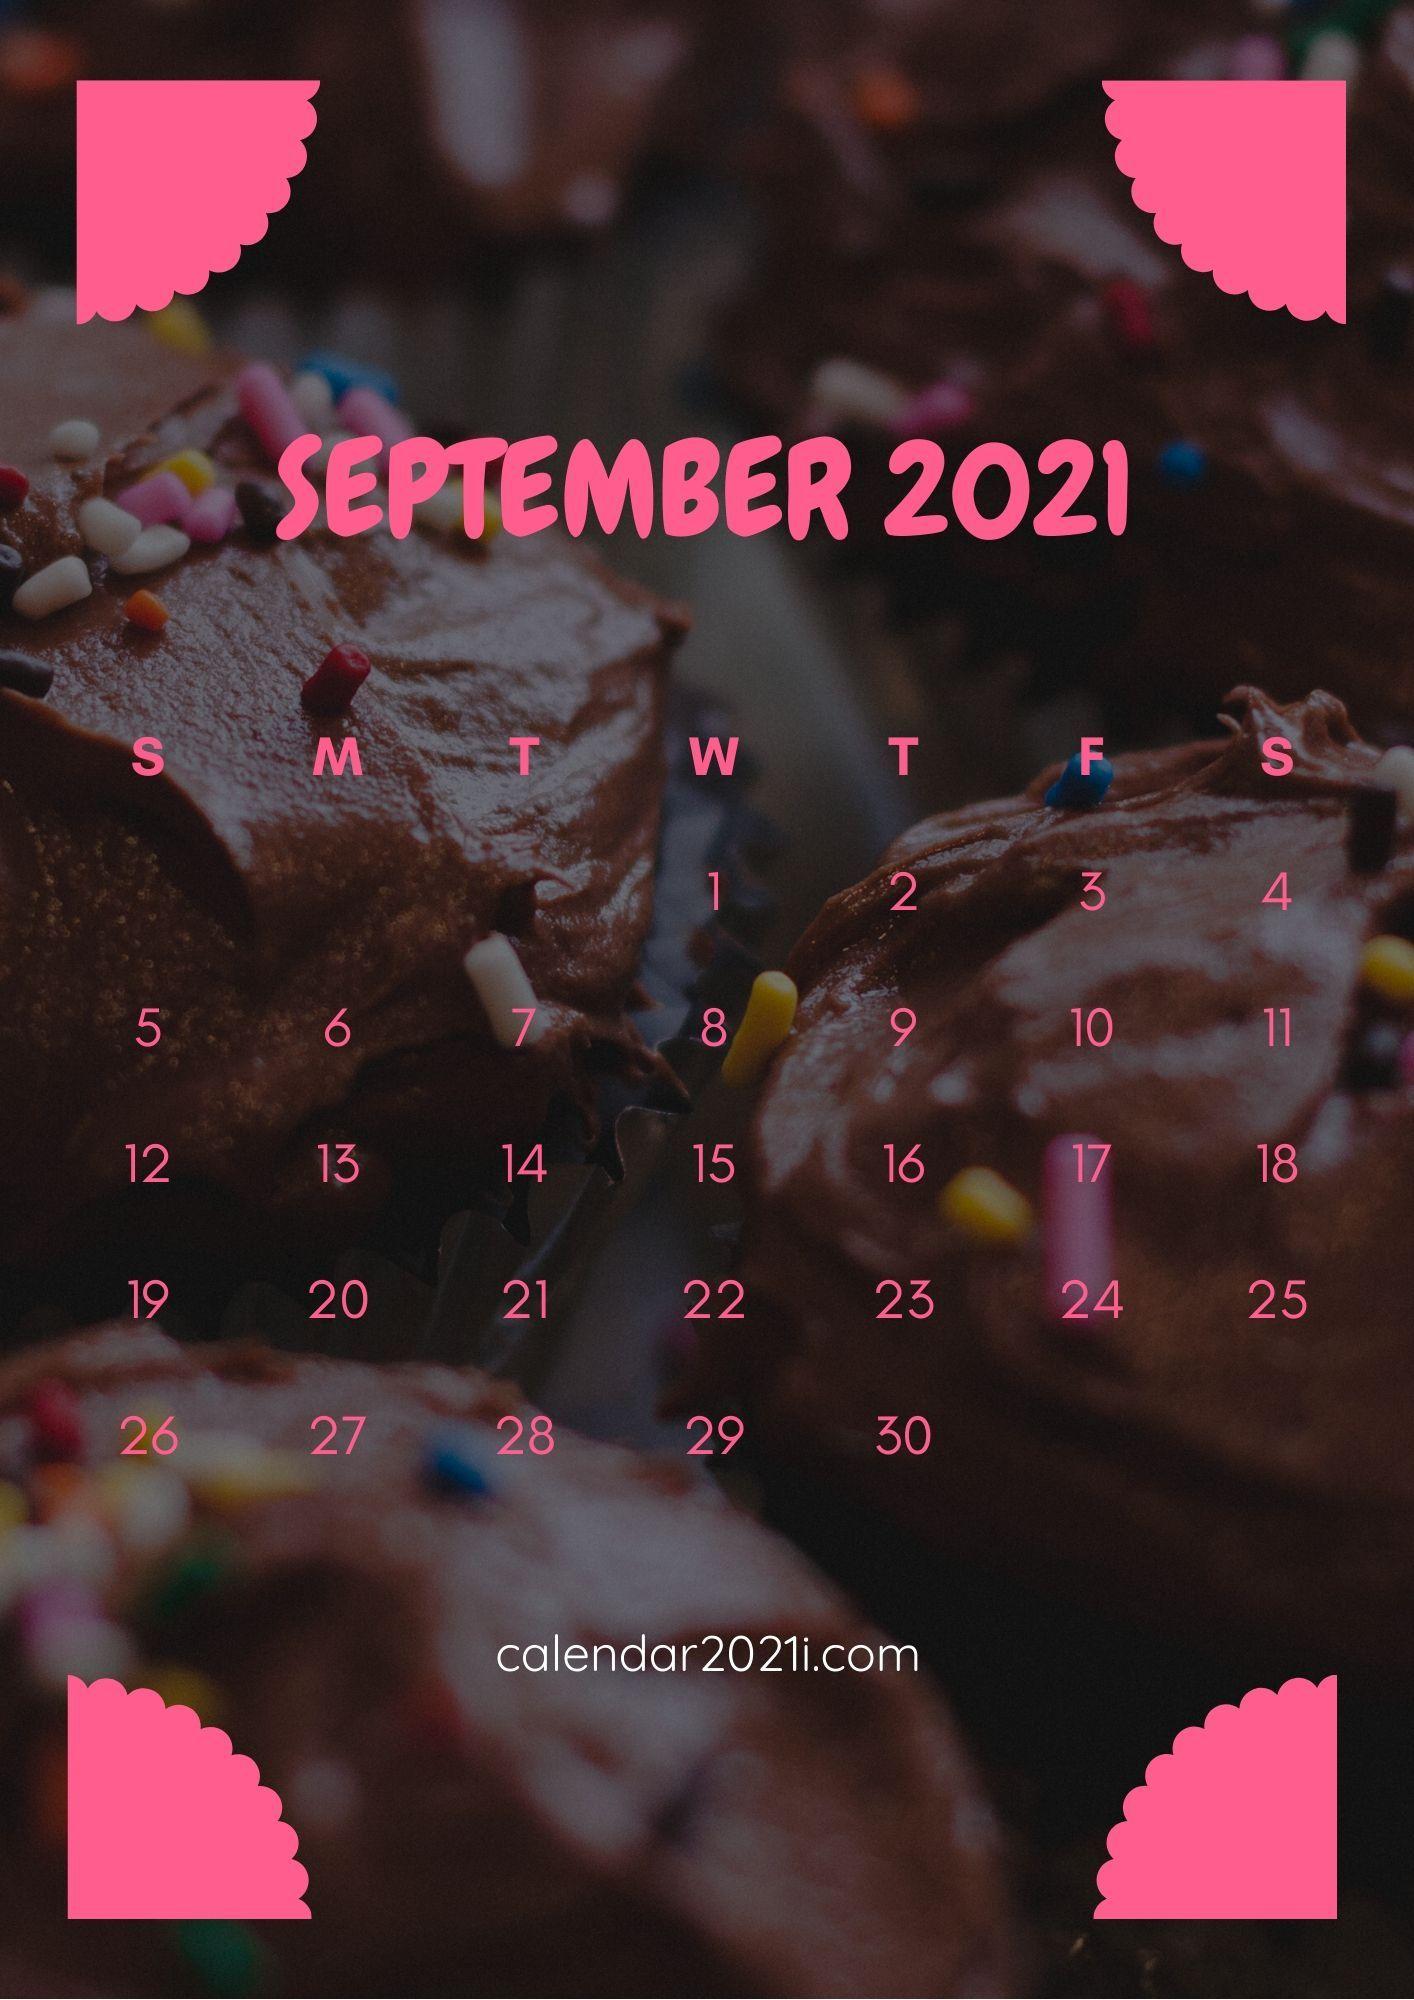 September Calendar 2021 iPhone HD Wallpaper with beautiful colors 1414x2000